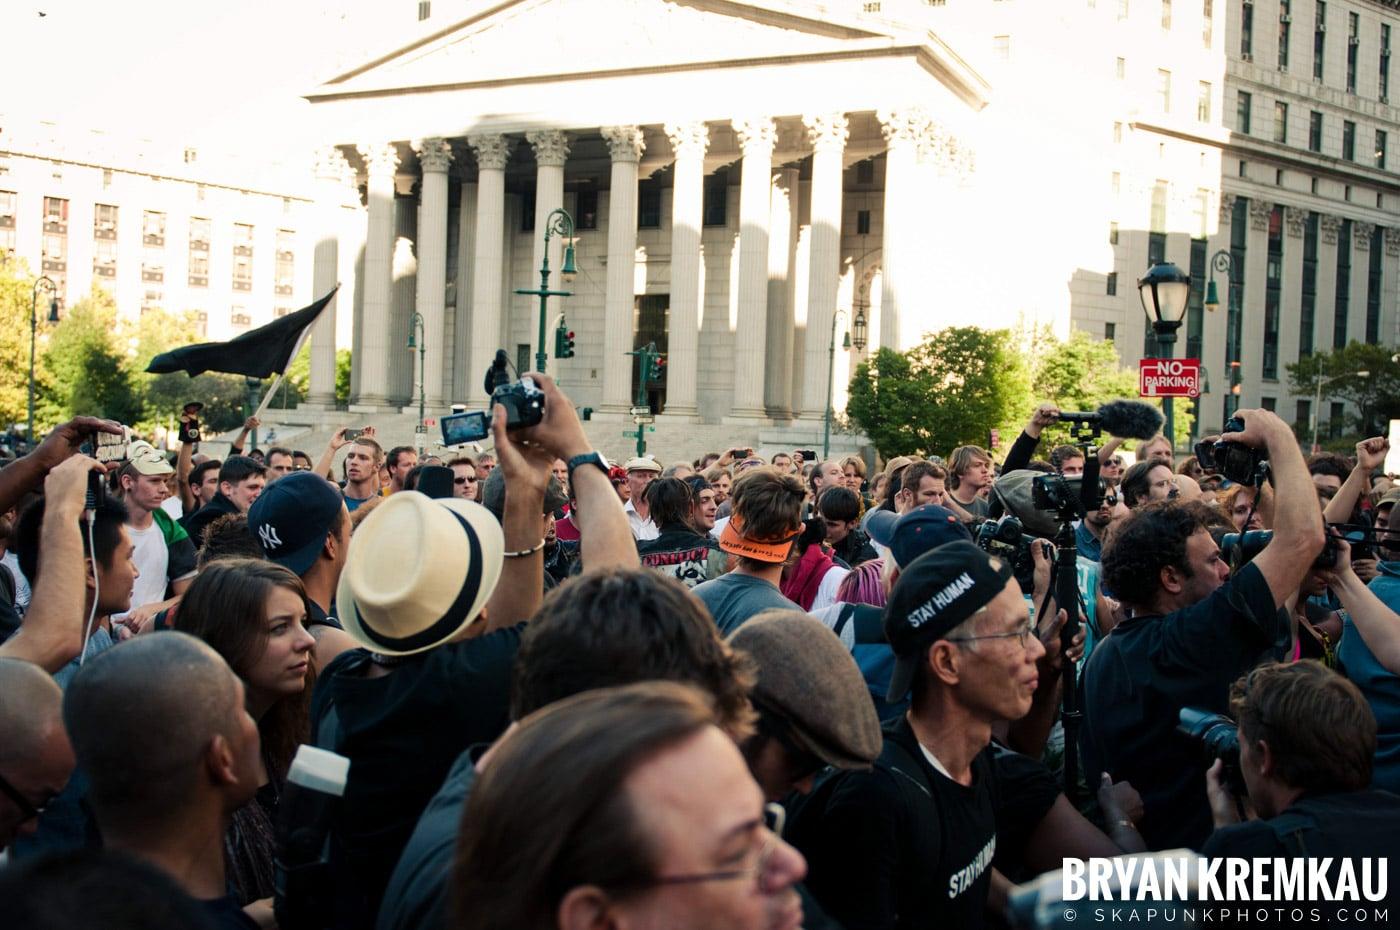 Tom Morello @ Occupy Wall Street Anniversary Concert, Foley Square, NYC - 9.16.12 (37)